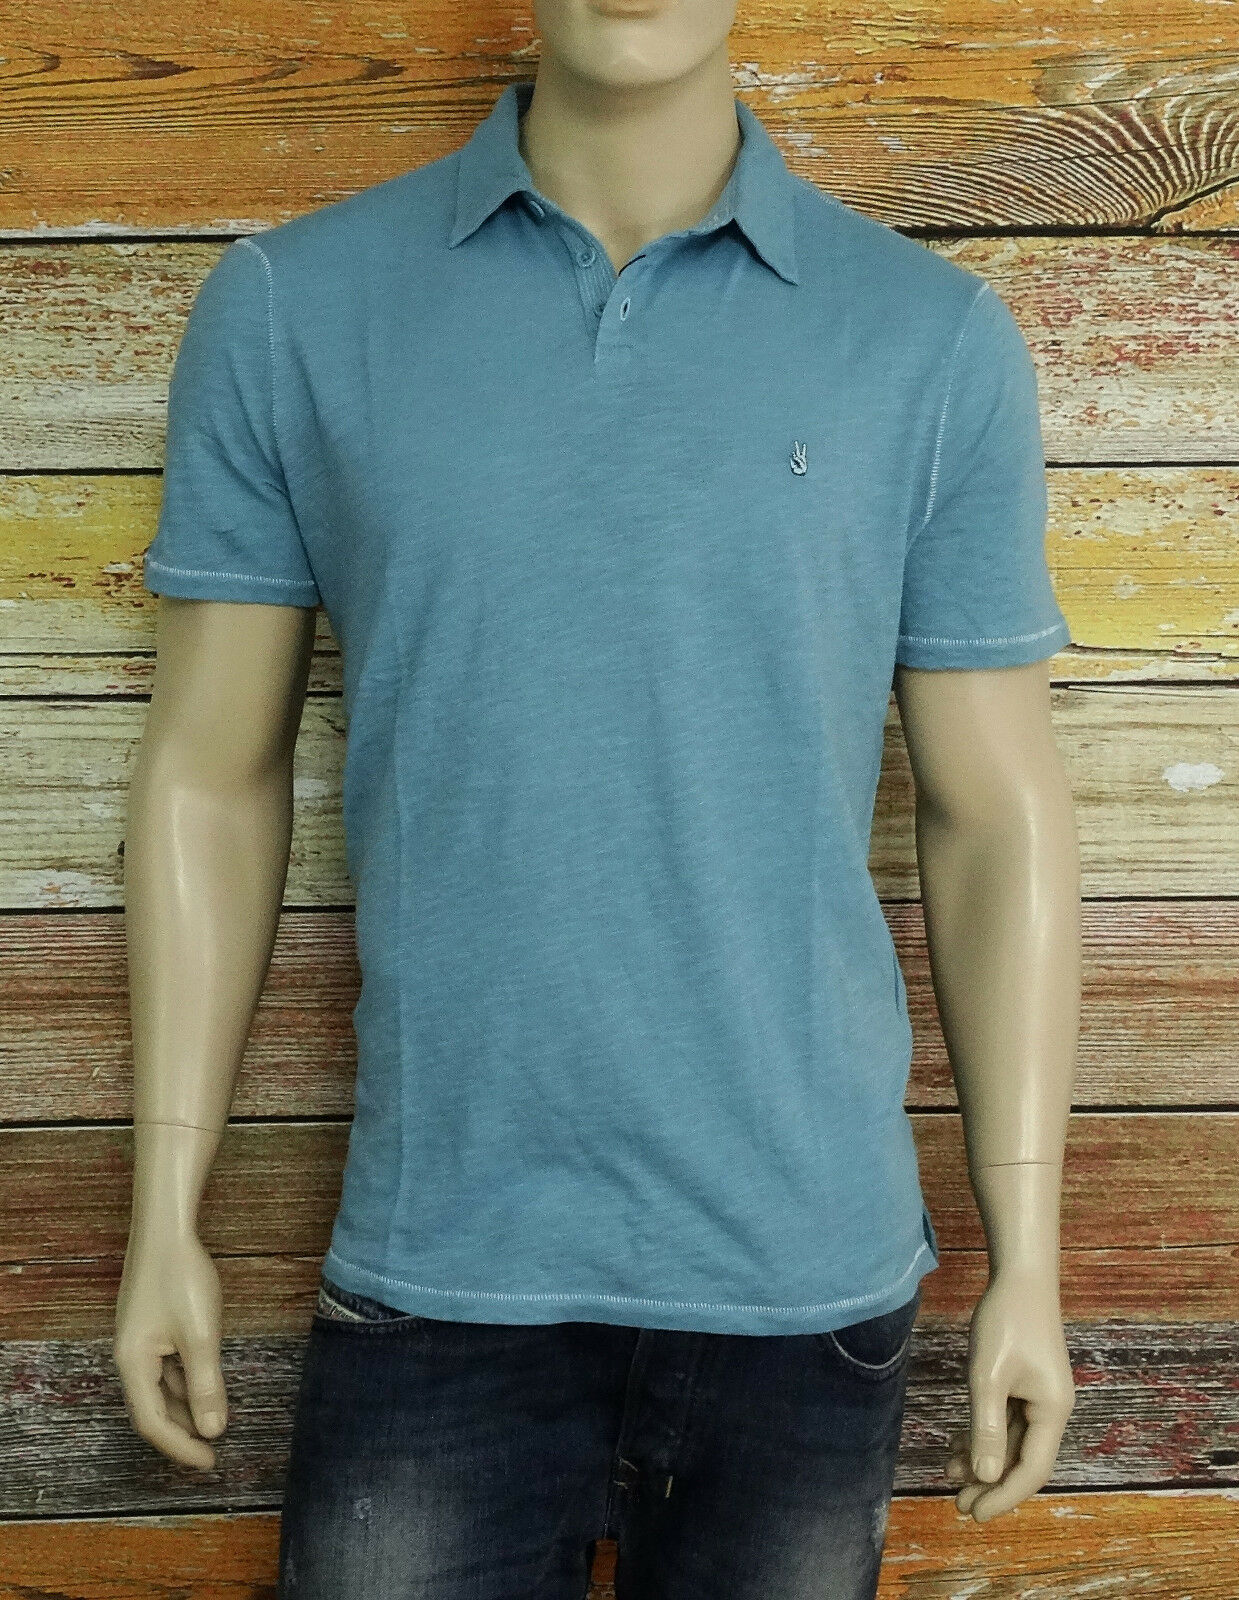 NEW John Varvatos Star USA Polo Shirt in Pale Aqua Size Large NWT 100% Cotton